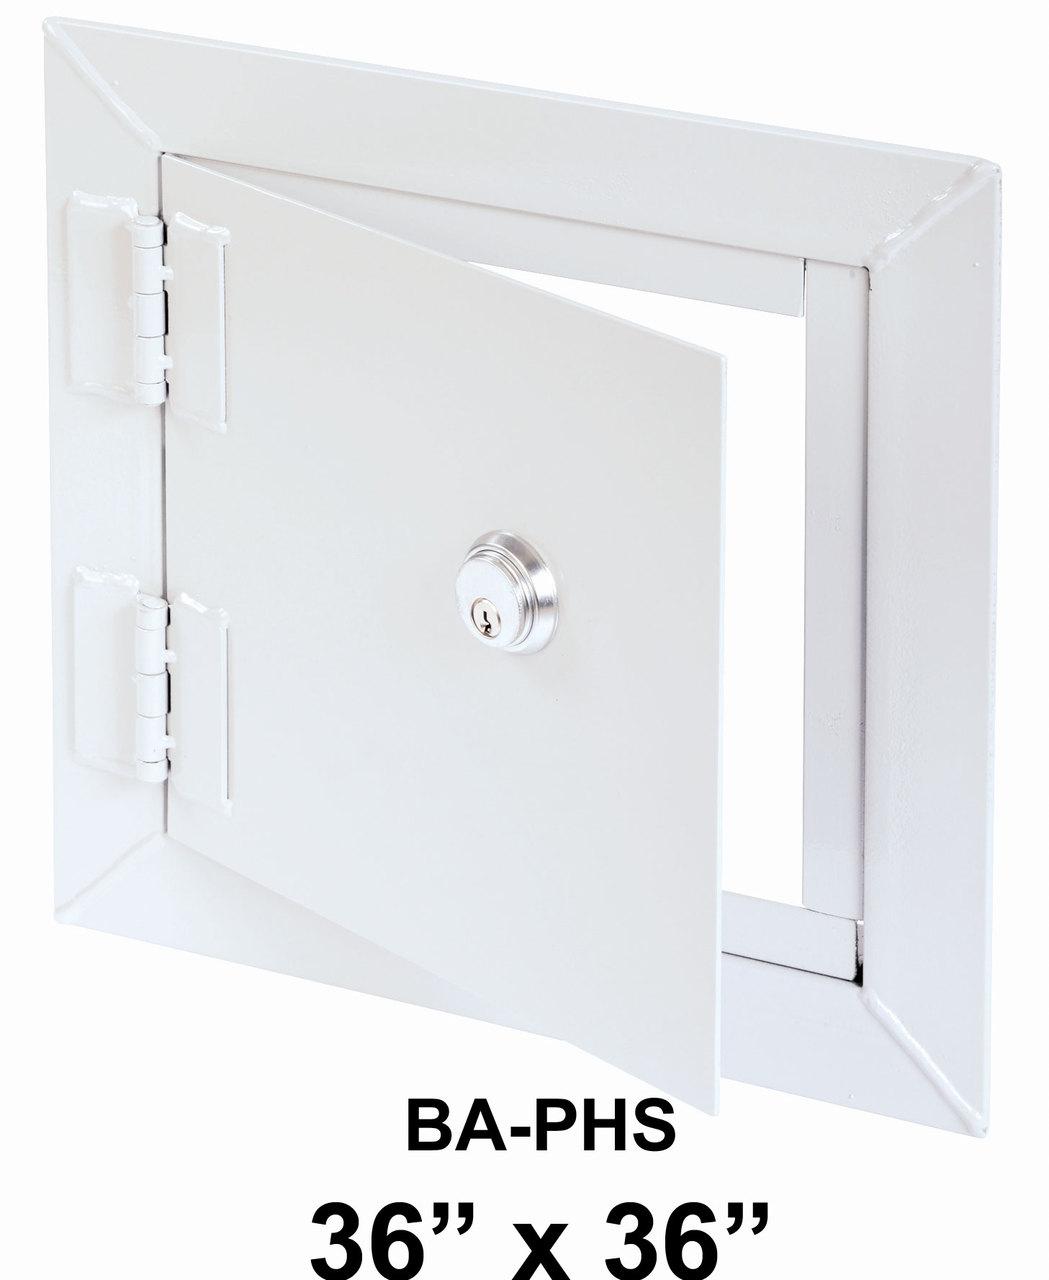 Best Access Panels BA-PHS 36